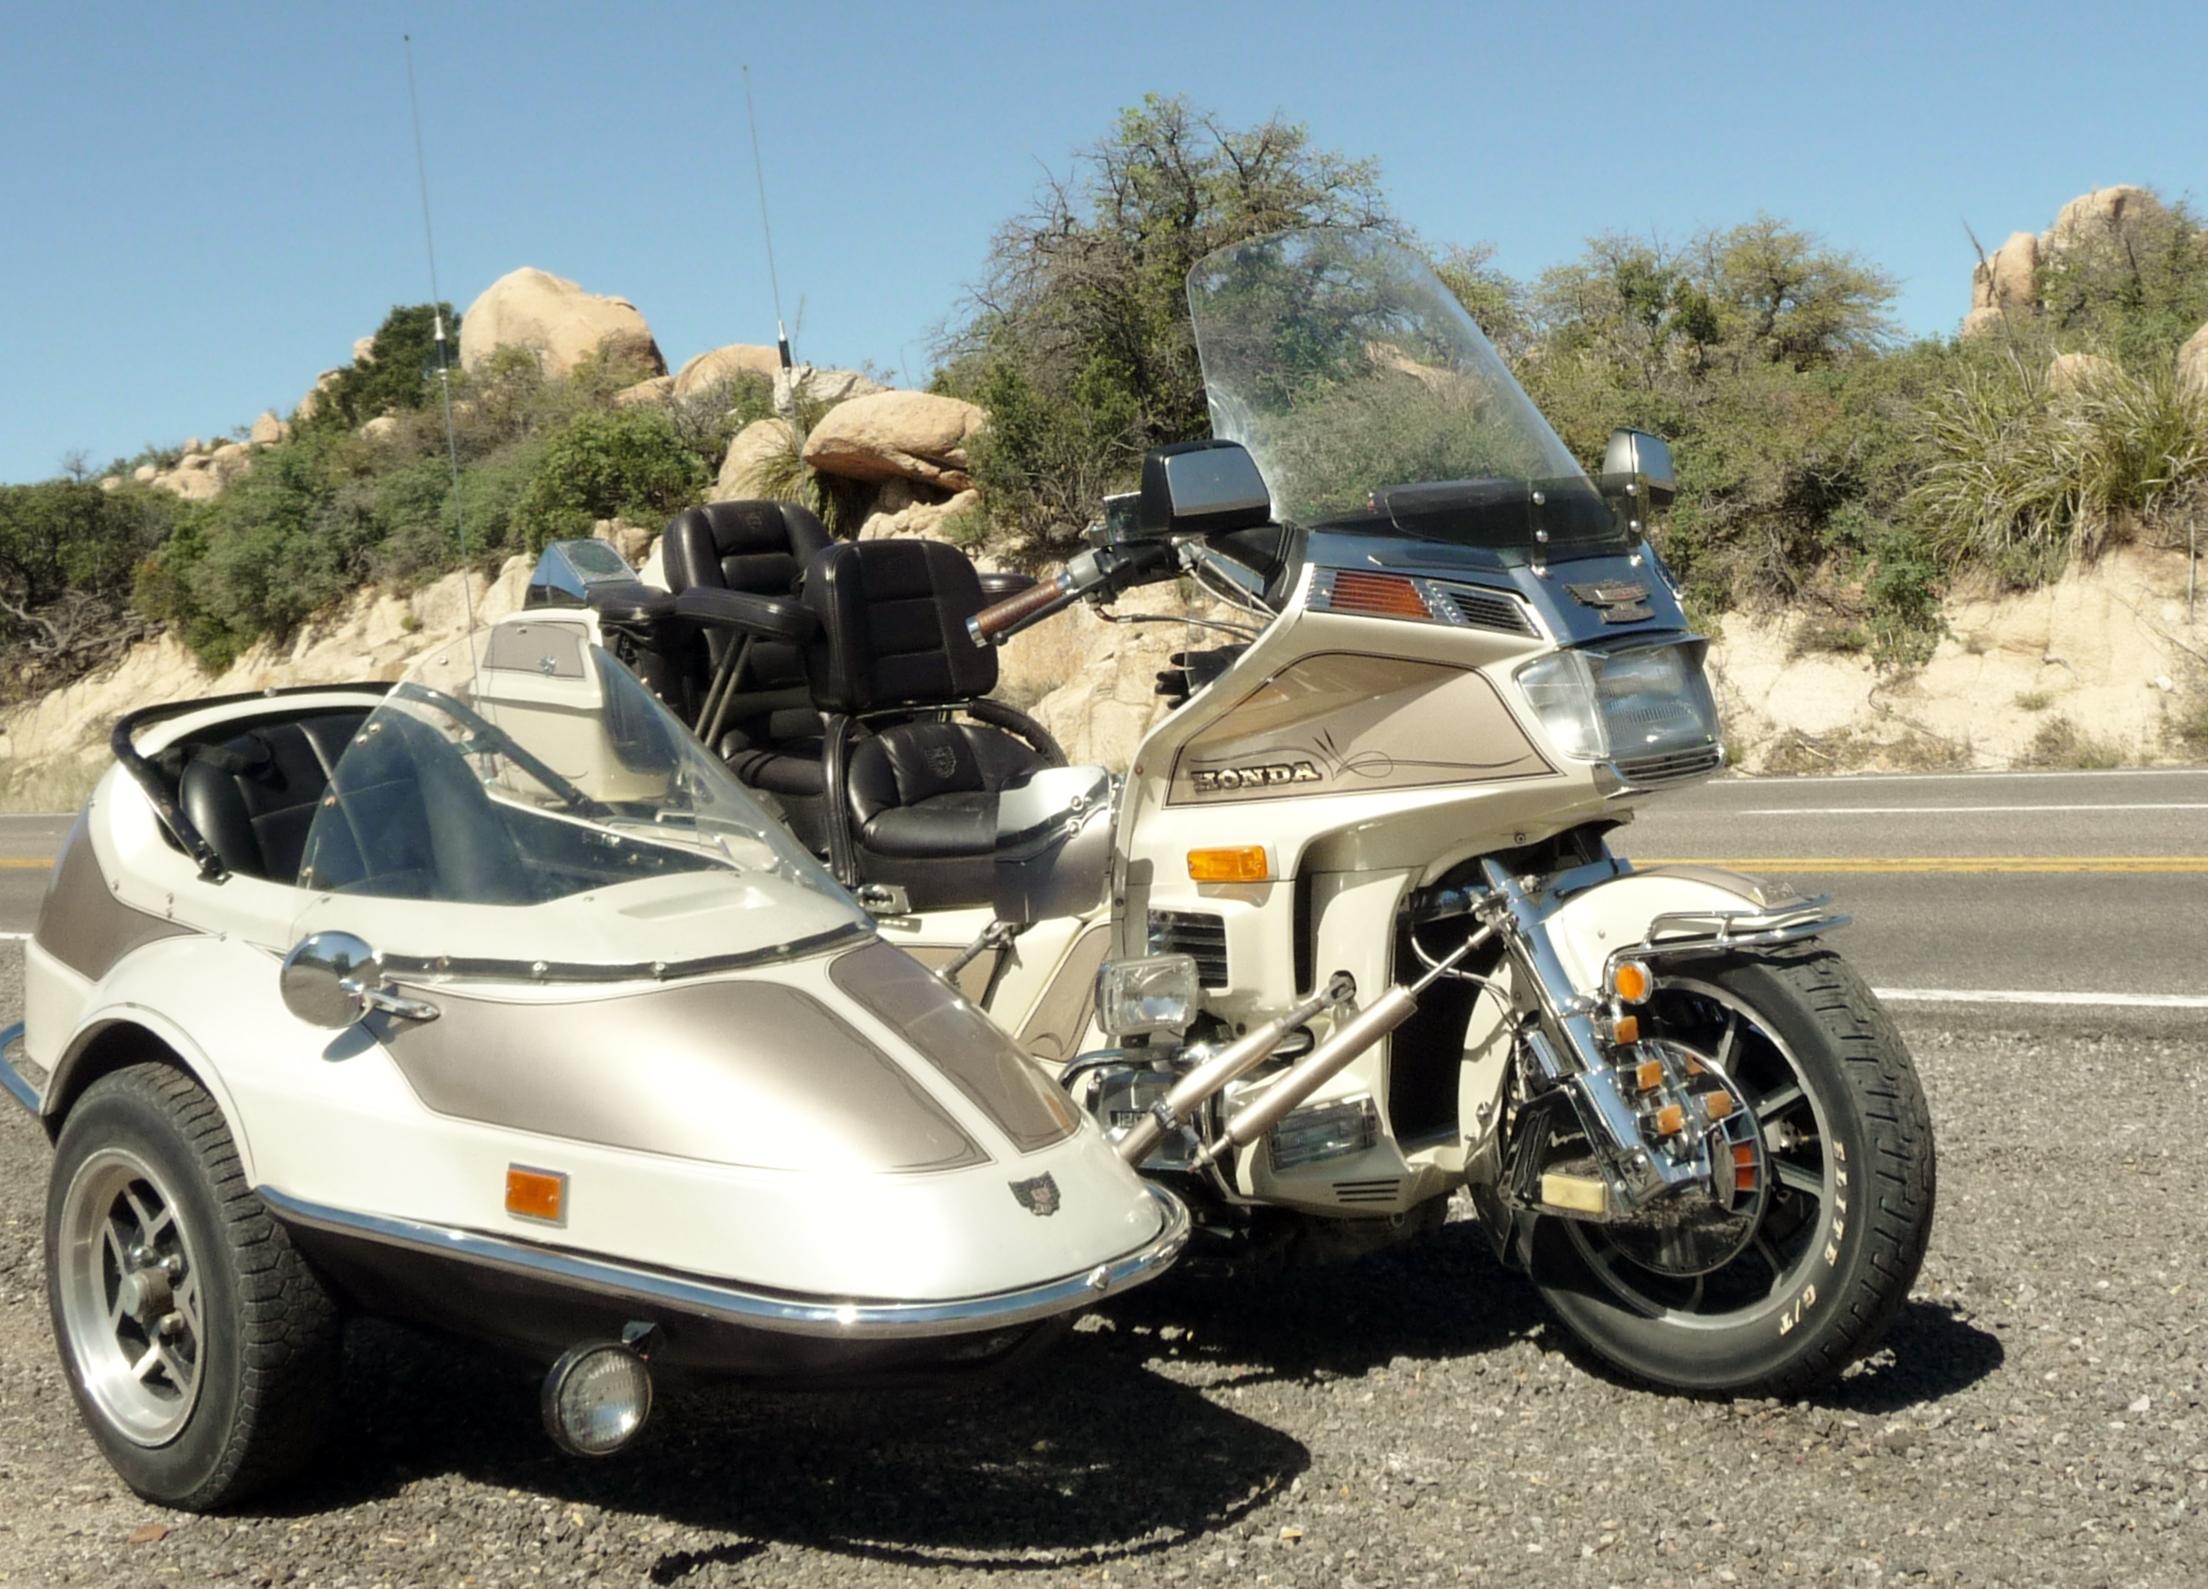 1986-gl1200-and-california-sidecar.jpg